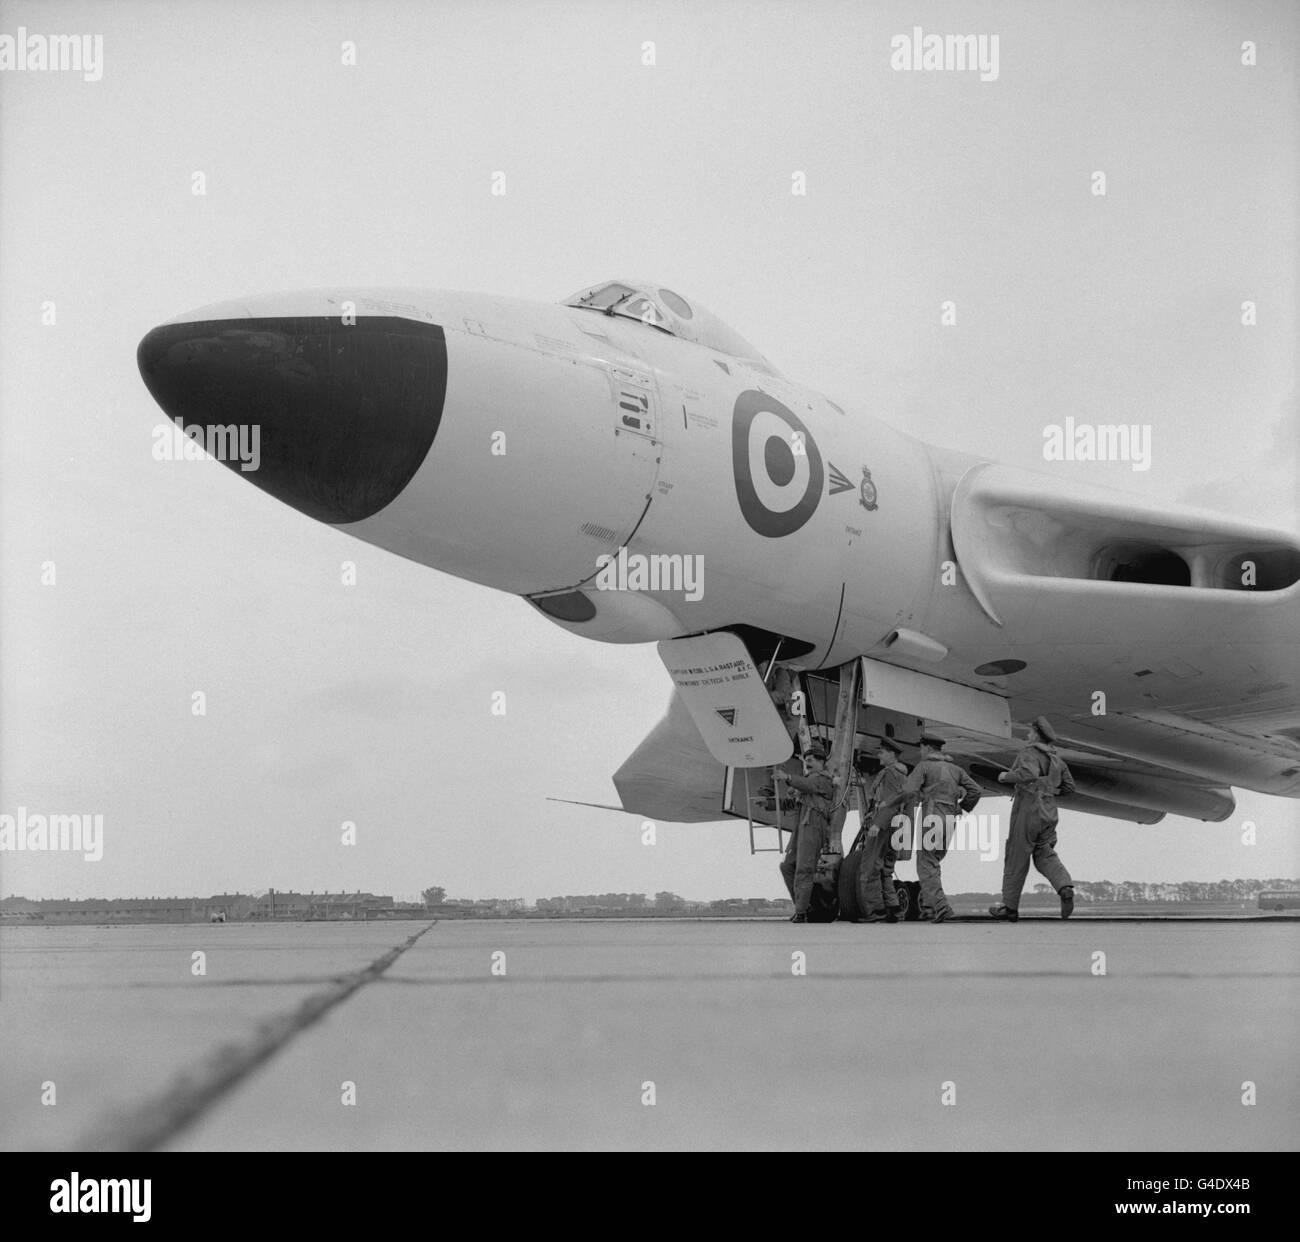 Aviation - Vulcan Bomber Scramble - RAF Scampton, Lincolnshire - Stock Image